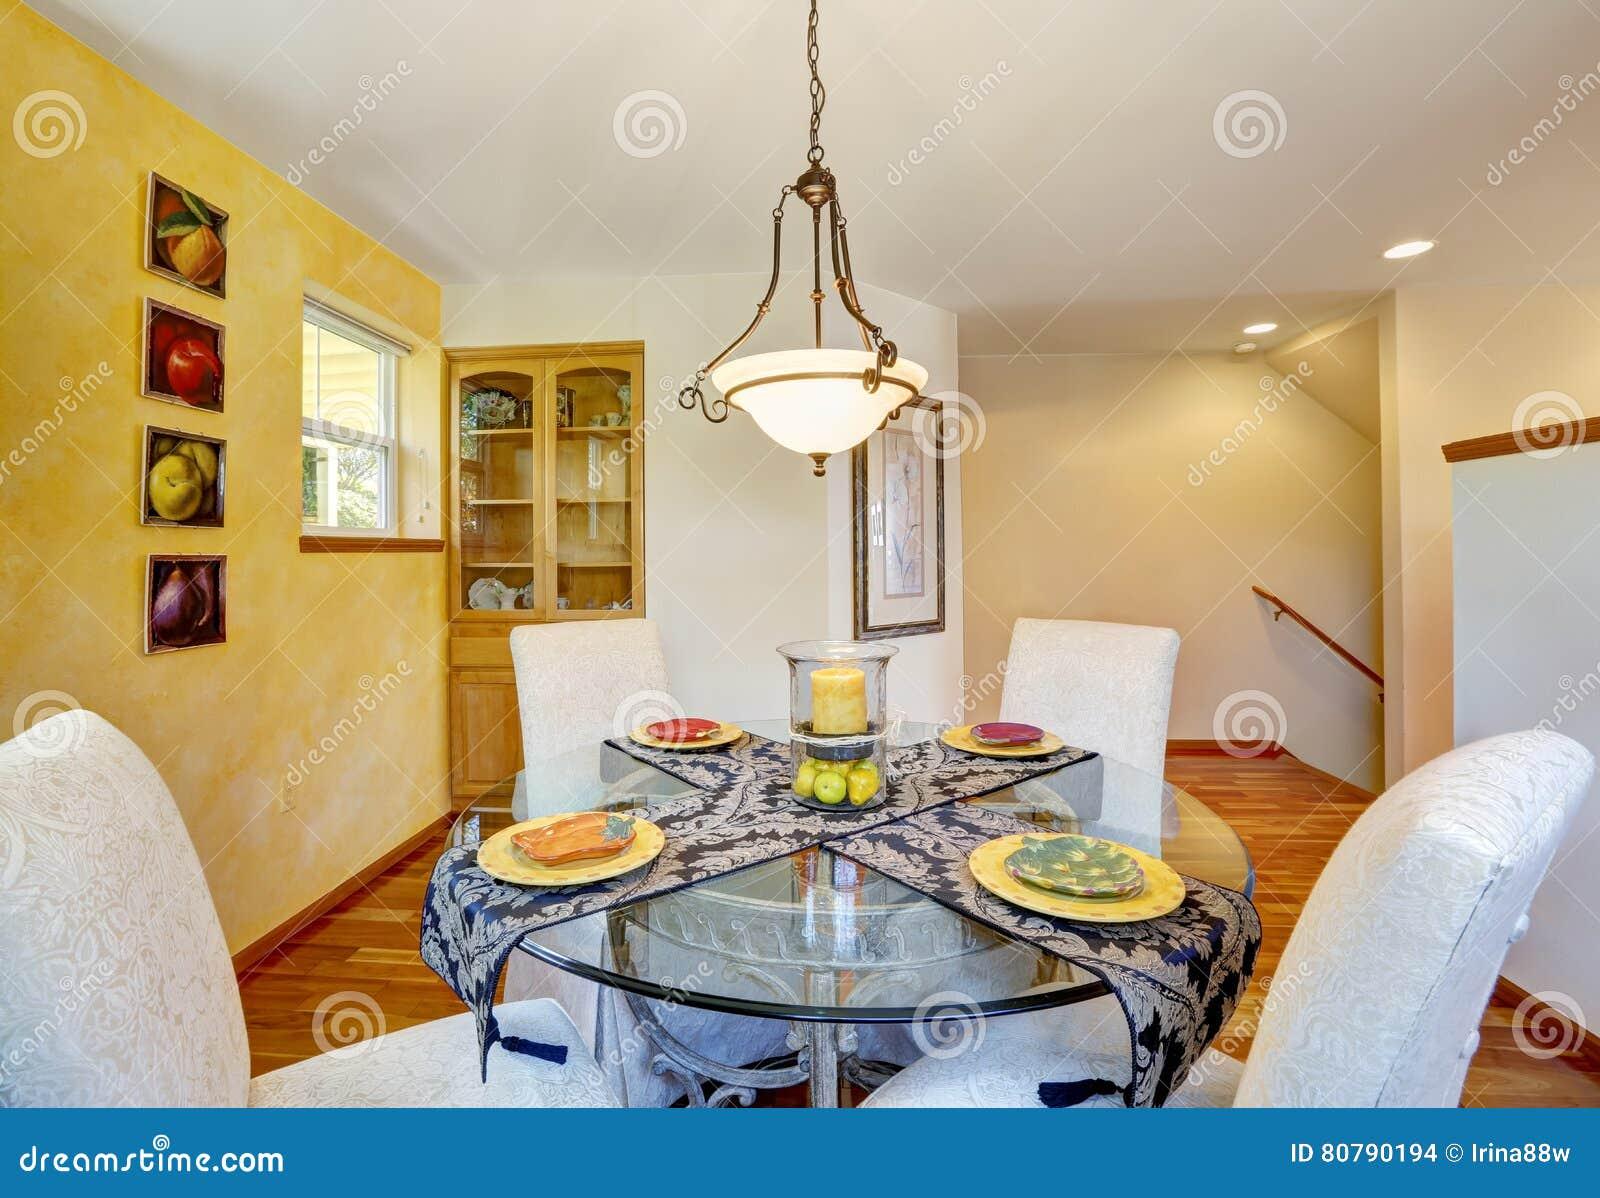 Binnenland van eetkamer met gele muur en hardhoutvloer stock foto